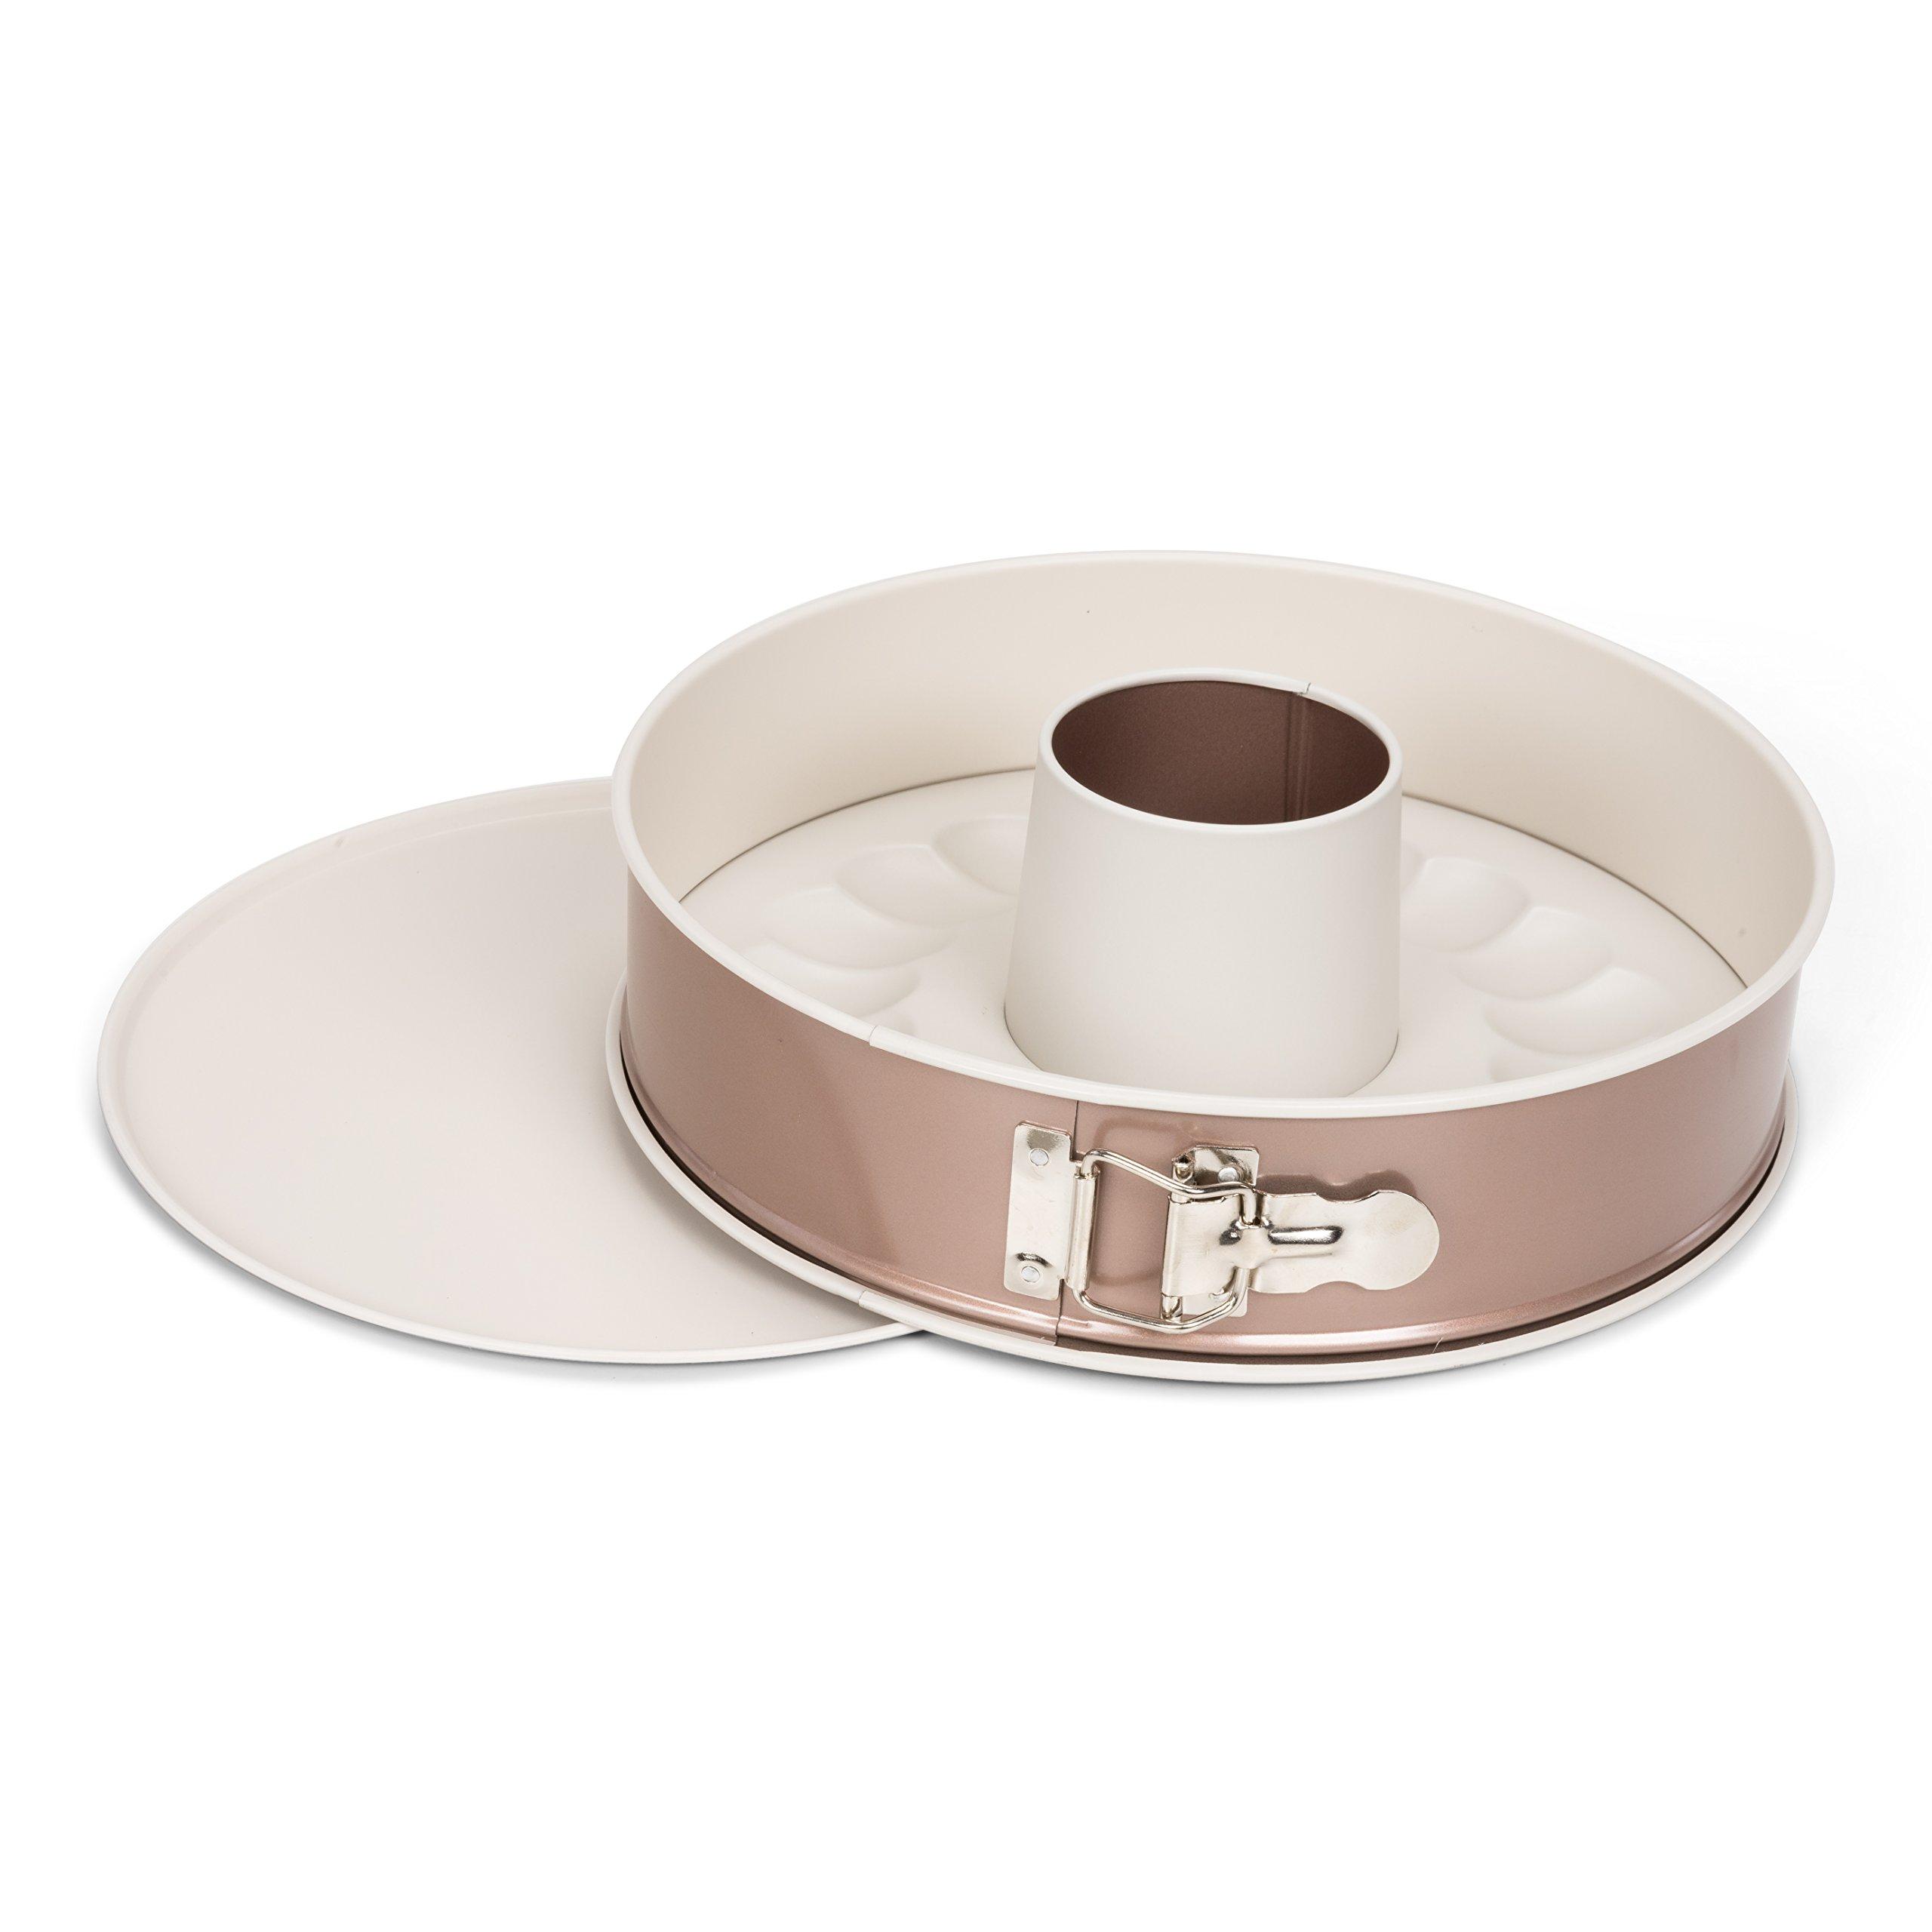 Patisse 03346 w/Extra Bottom Ceramic Springform Bundt Pan 10-1/4''(26 cm), 10.25'', Copper Off White by patisse (Image #1)